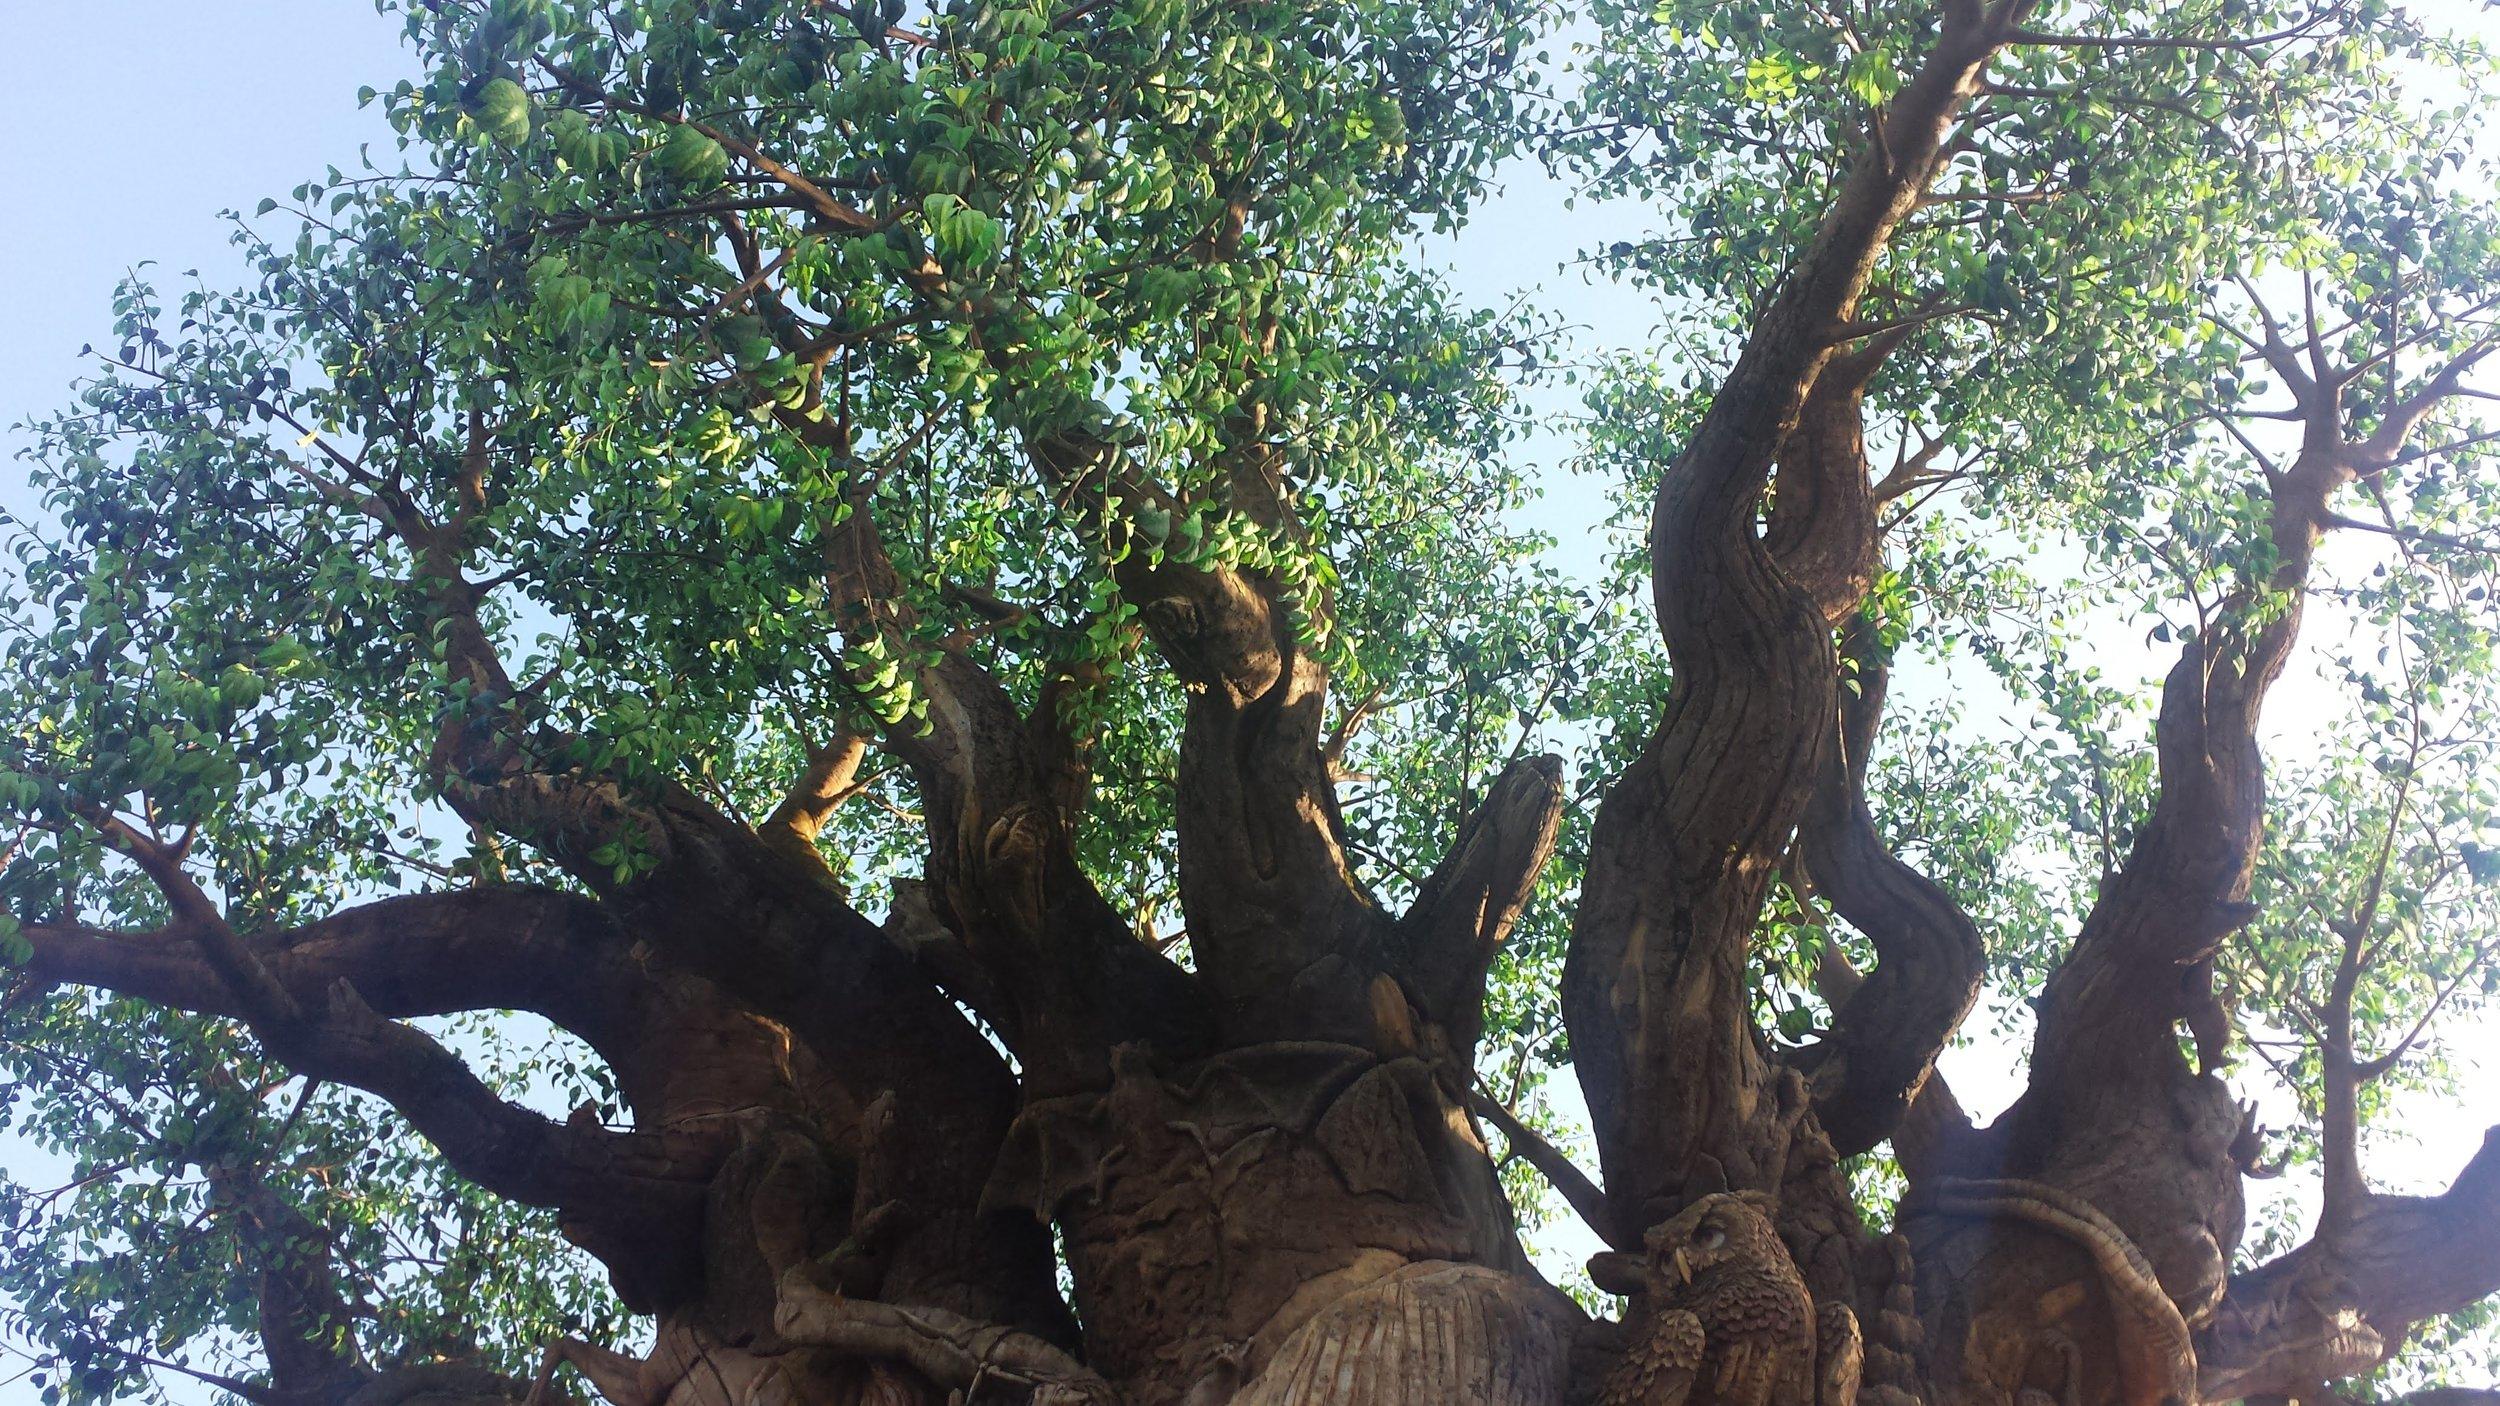 the tree of life at animal kingdom in walt disney world.